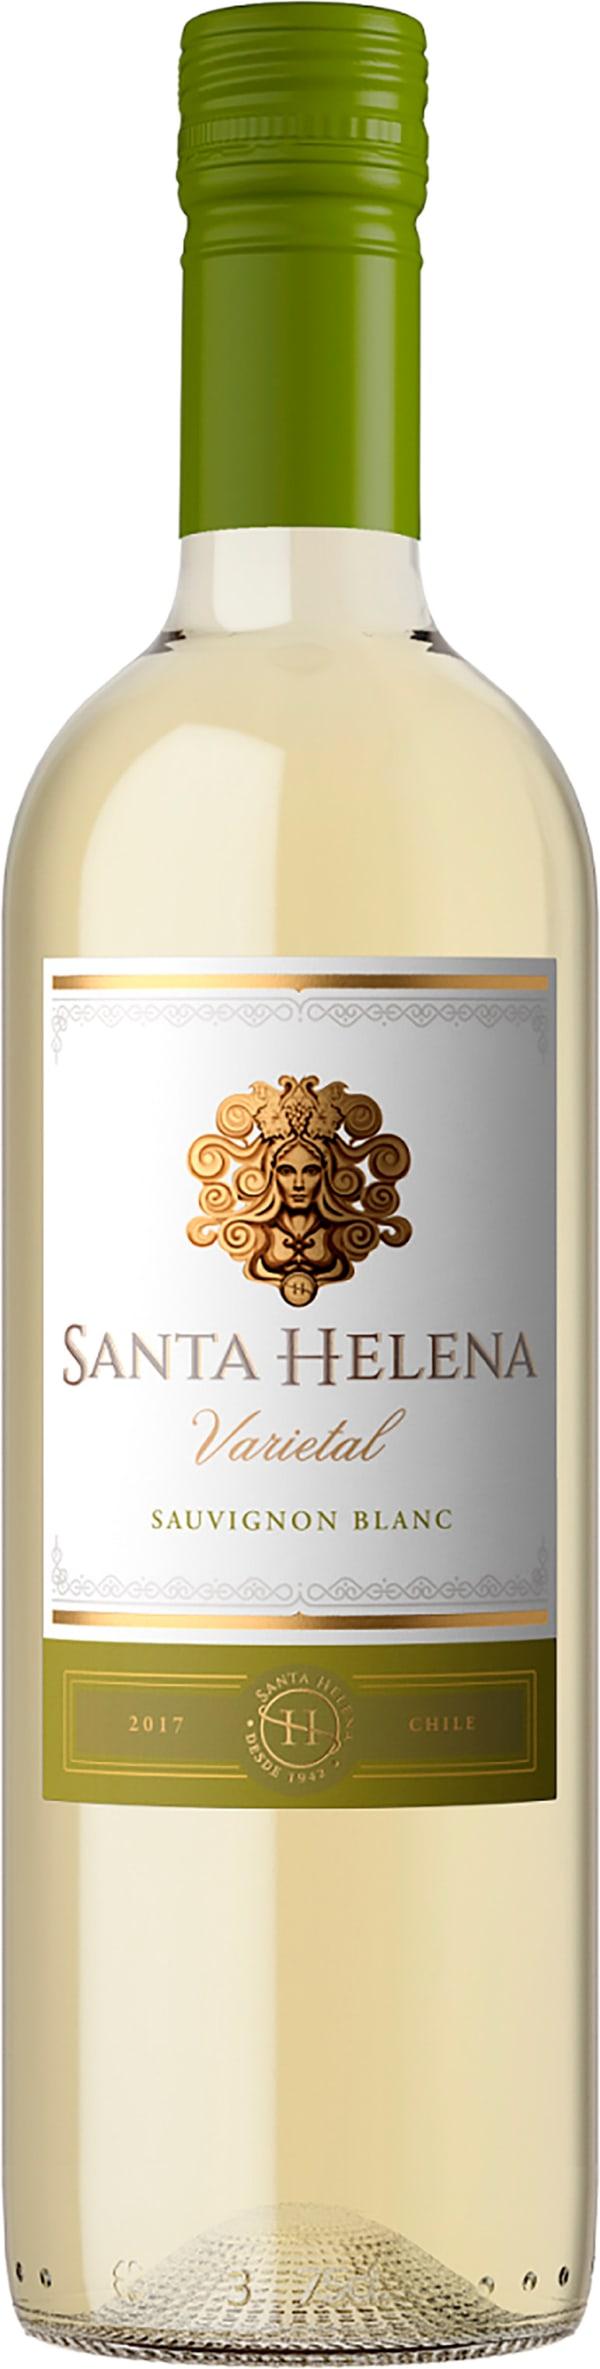 Santa Helena Varietal Sauvignon Blanc 2019